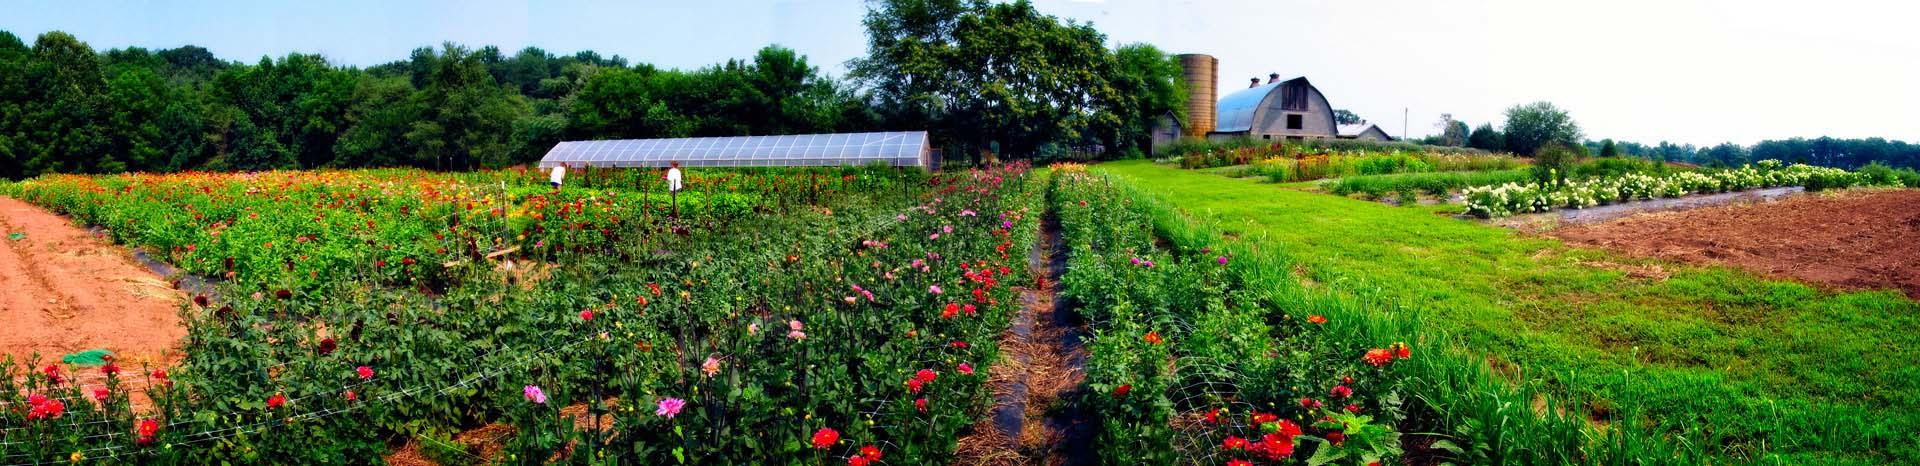 Flower Farm Farmer Florist Studios Lynnvale Studios Llc